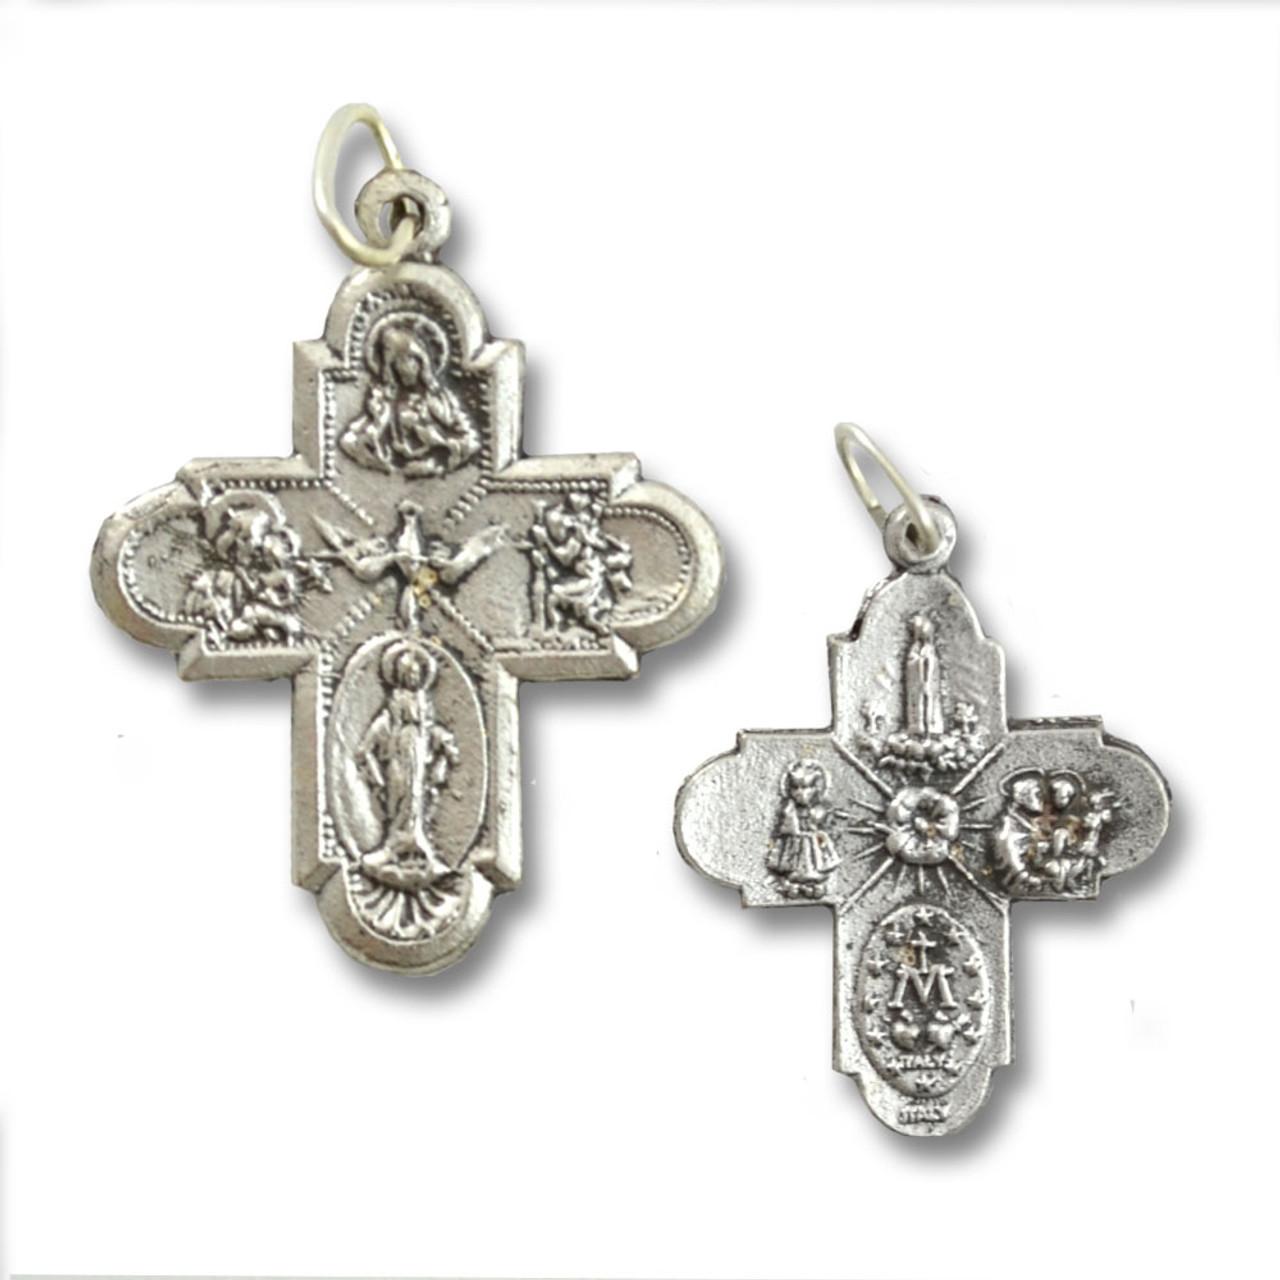 "1"" Two-Sided Silver Oxidized 4-Way Cross"